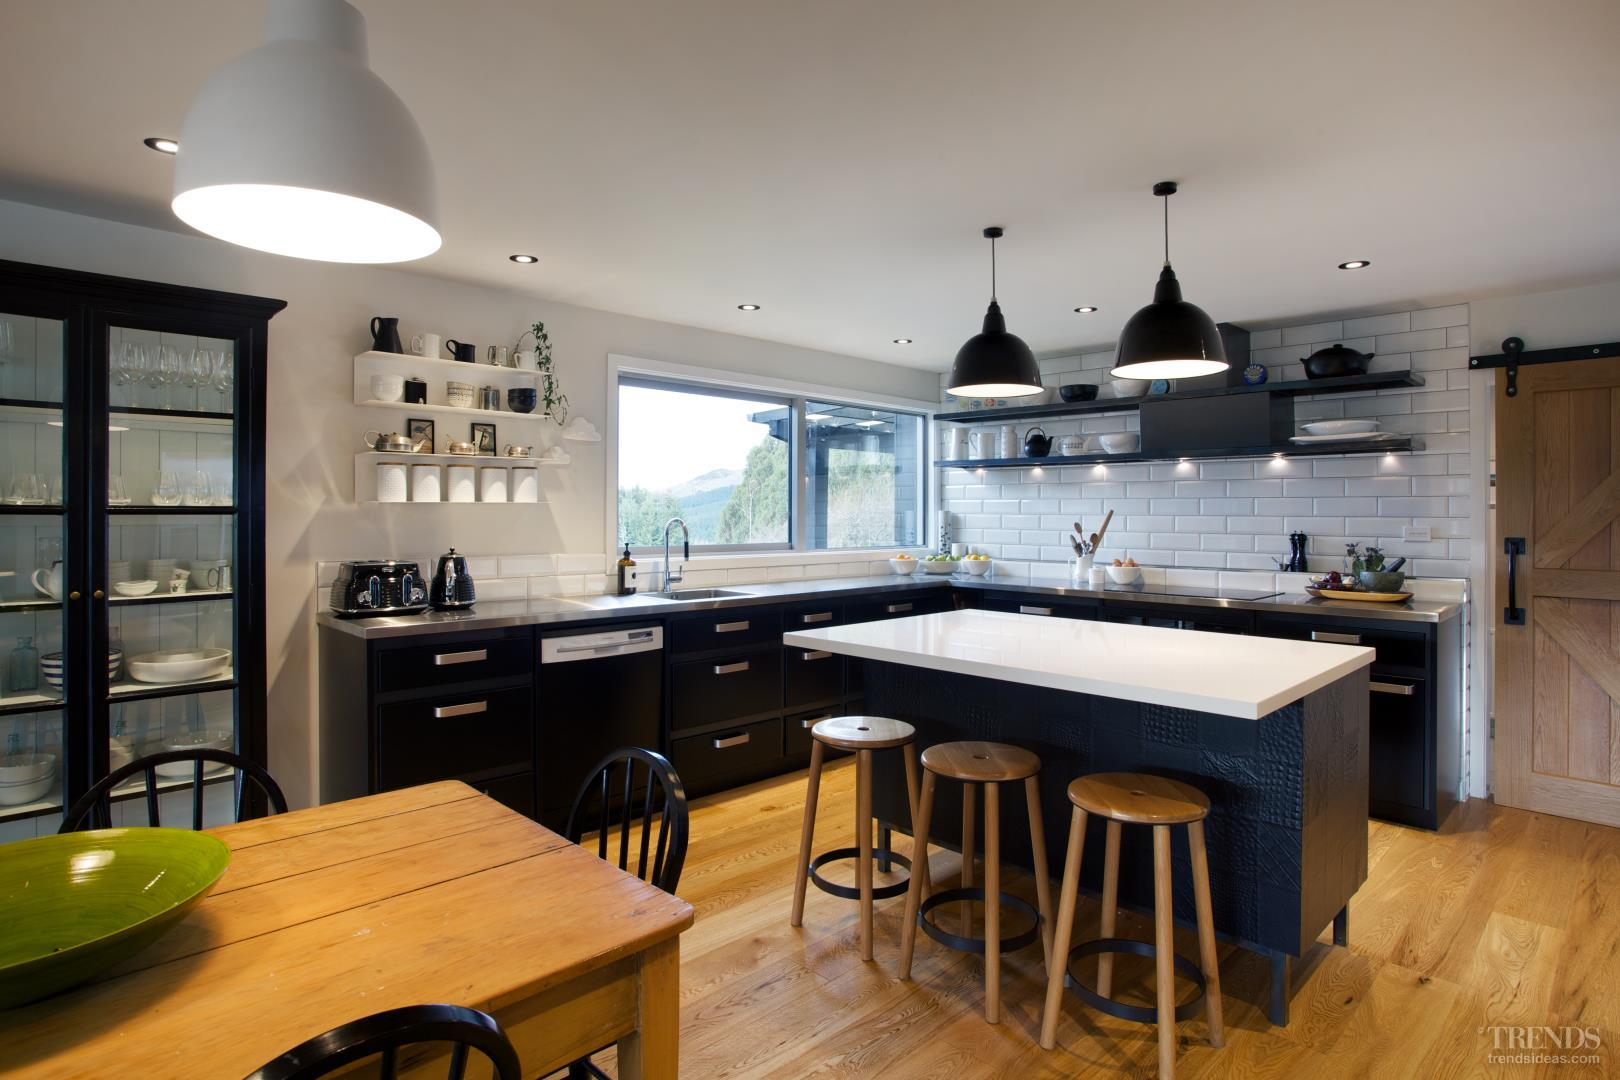 Farmhouse kitchen renovation has steel benchtops, cabinets…